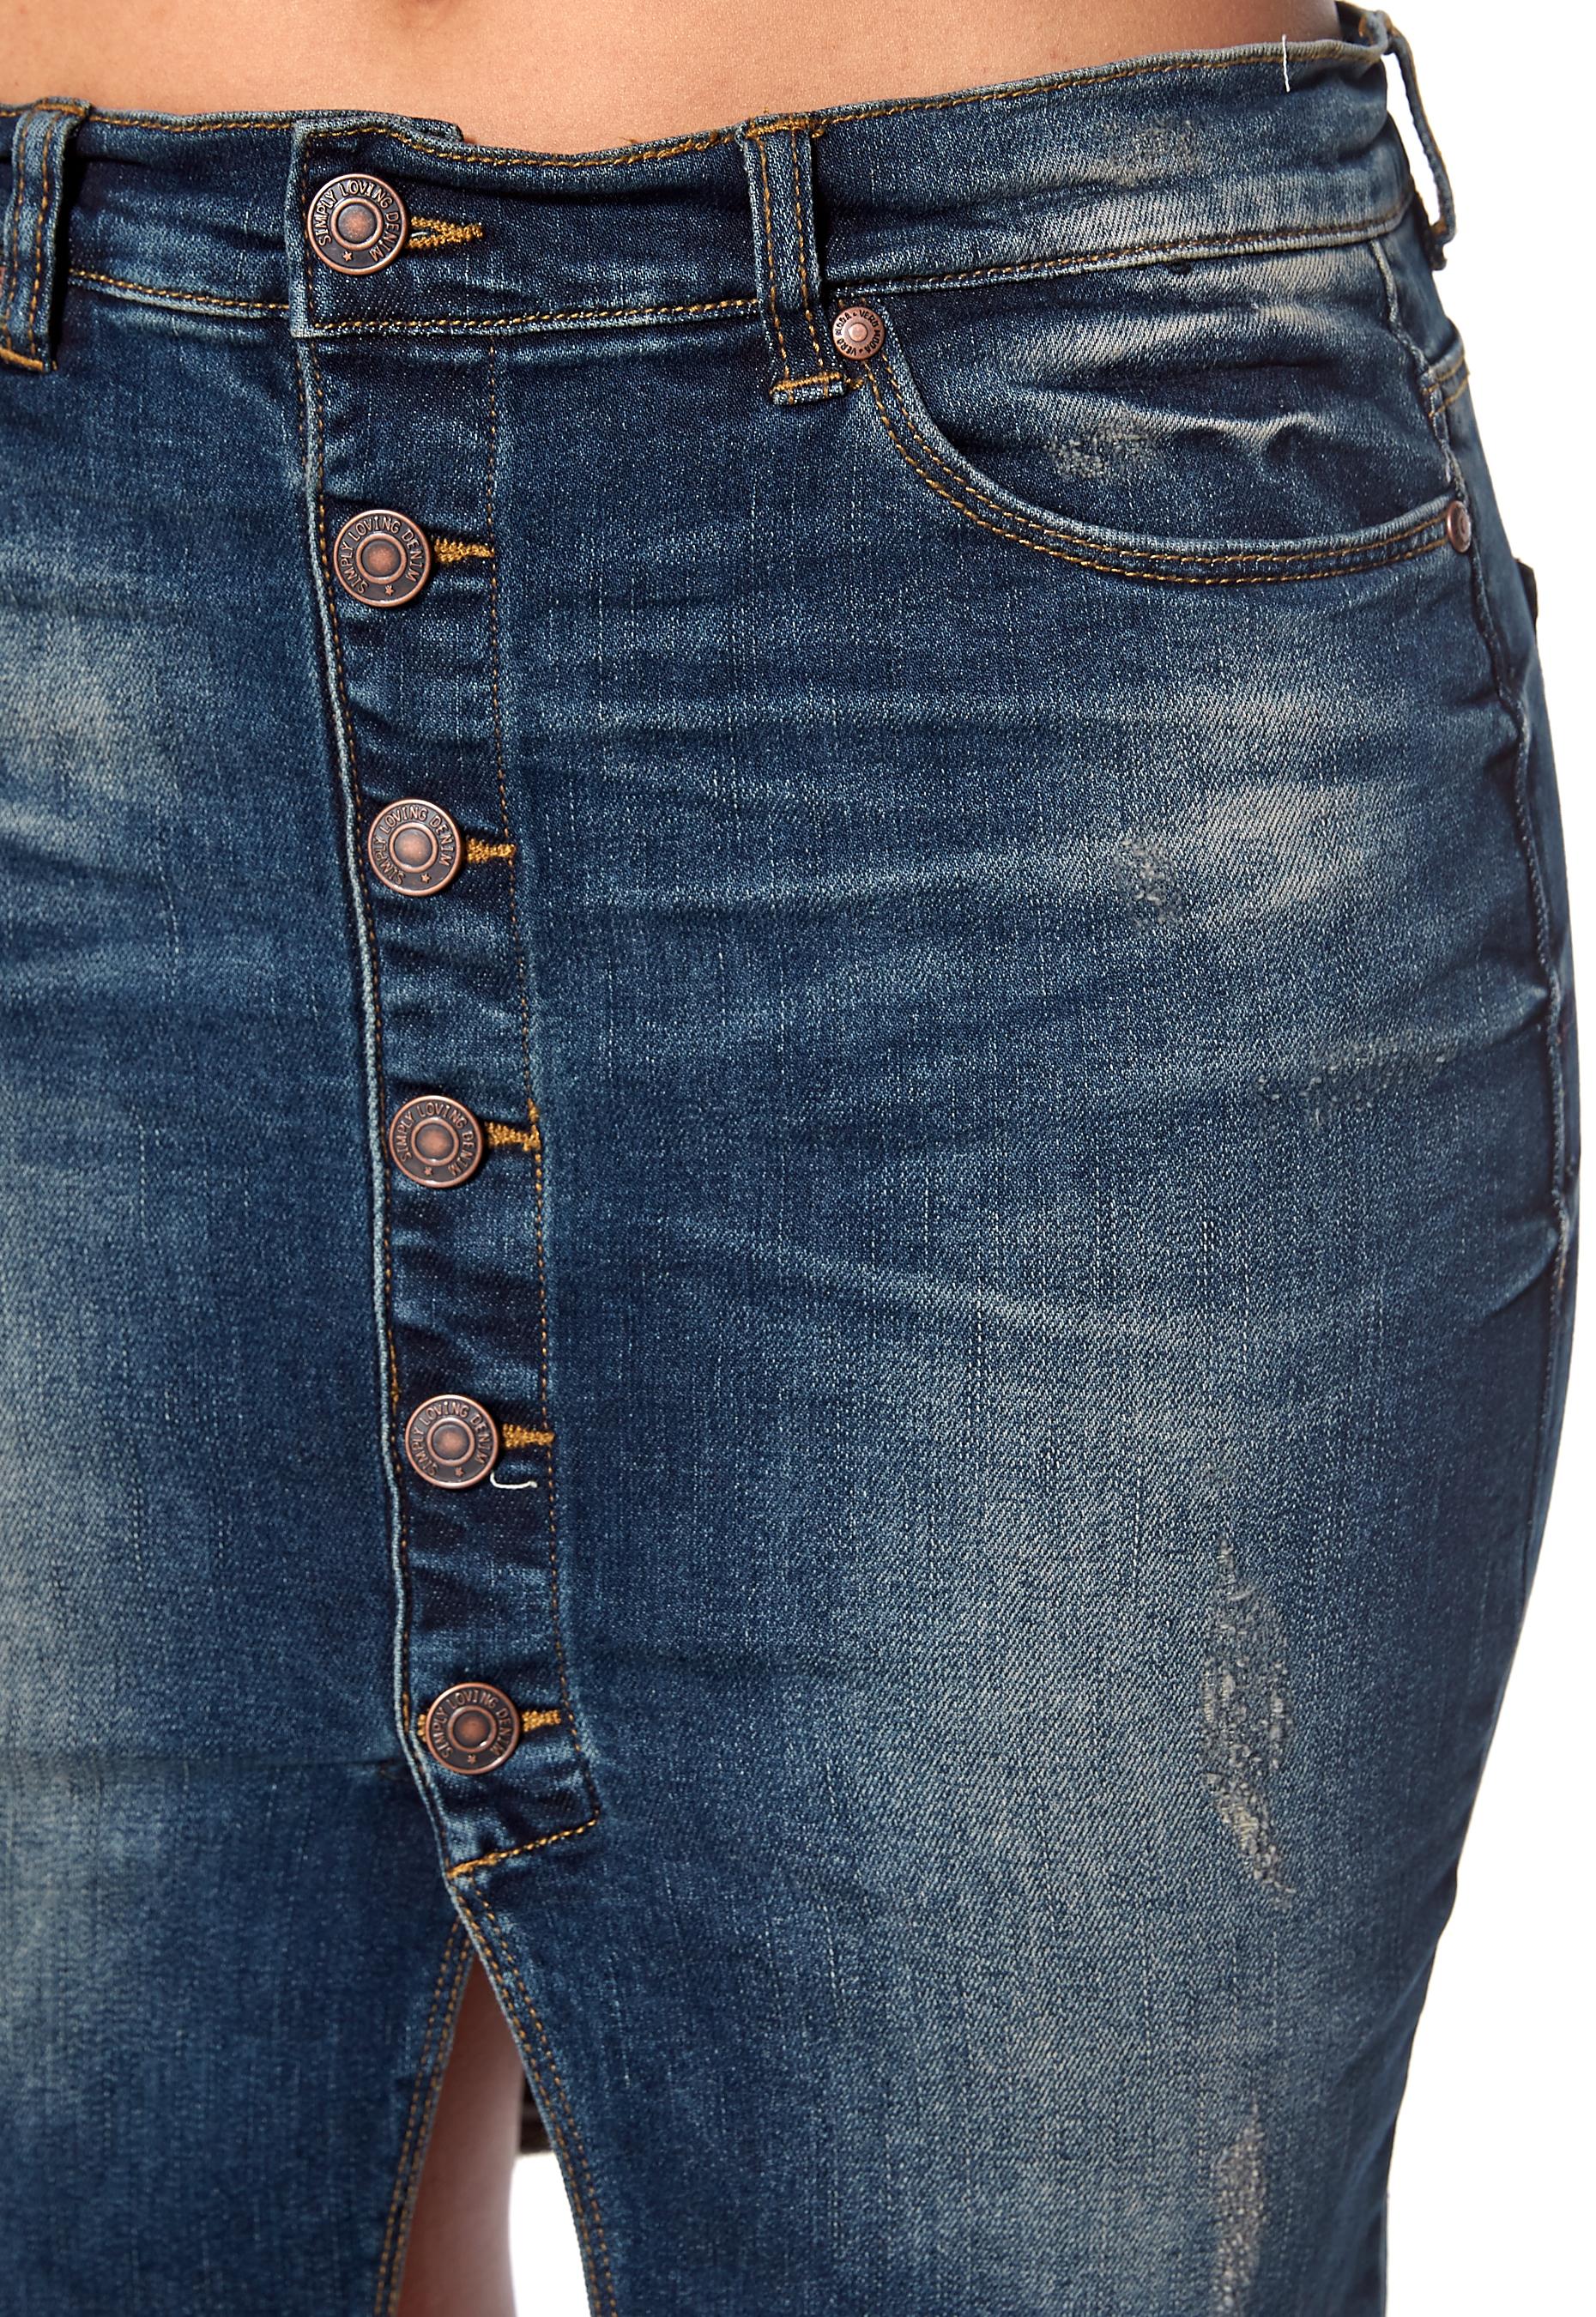 VERO MODA Seven Slim Button Skirt Dark Blue Denim - Bubbleroom 6c662fc80